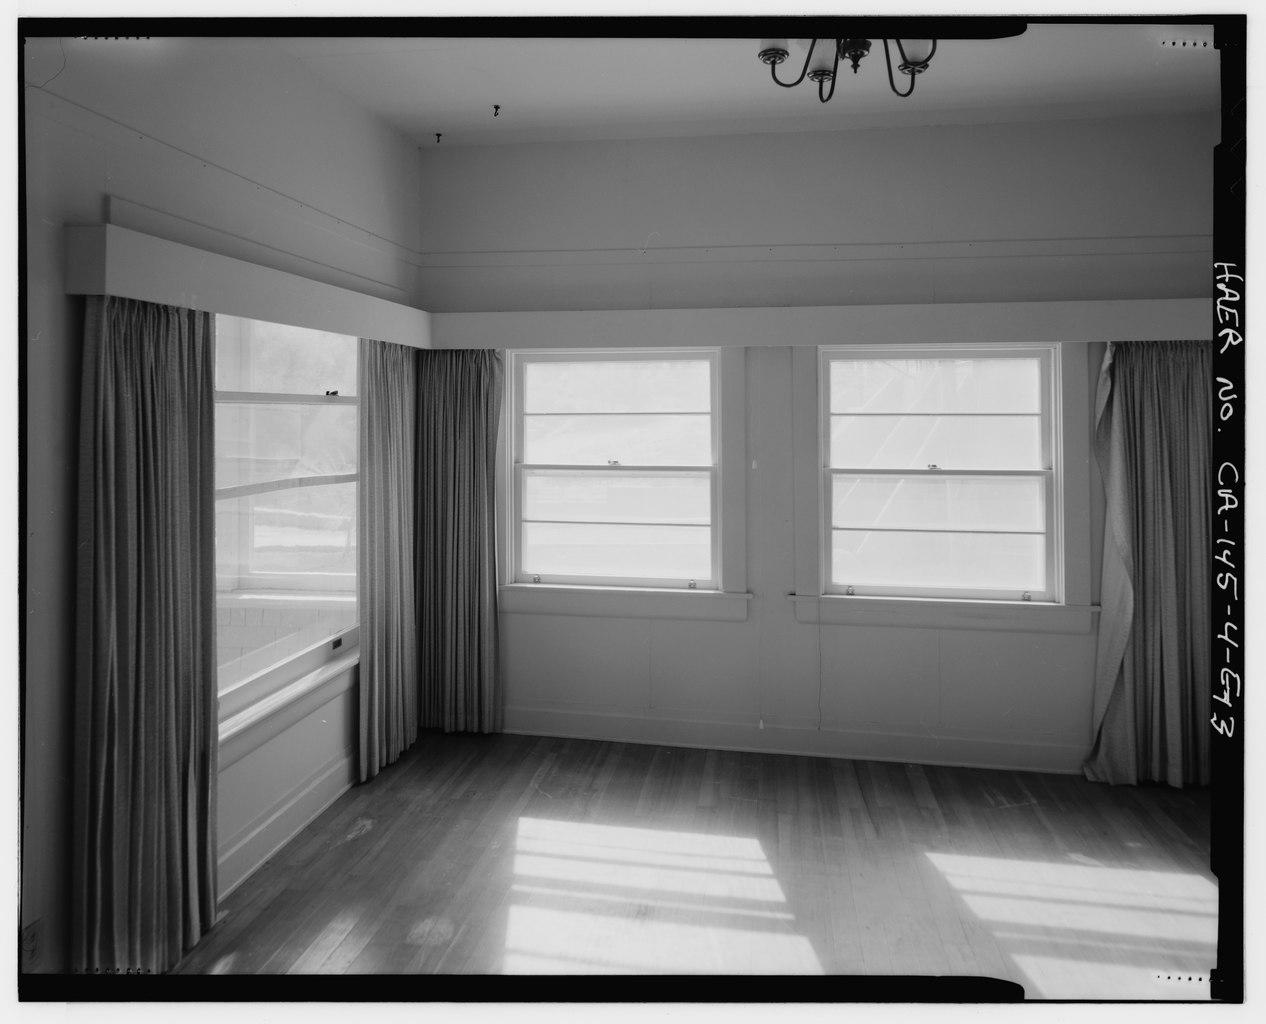 Interior Wall Transom Between Rooms